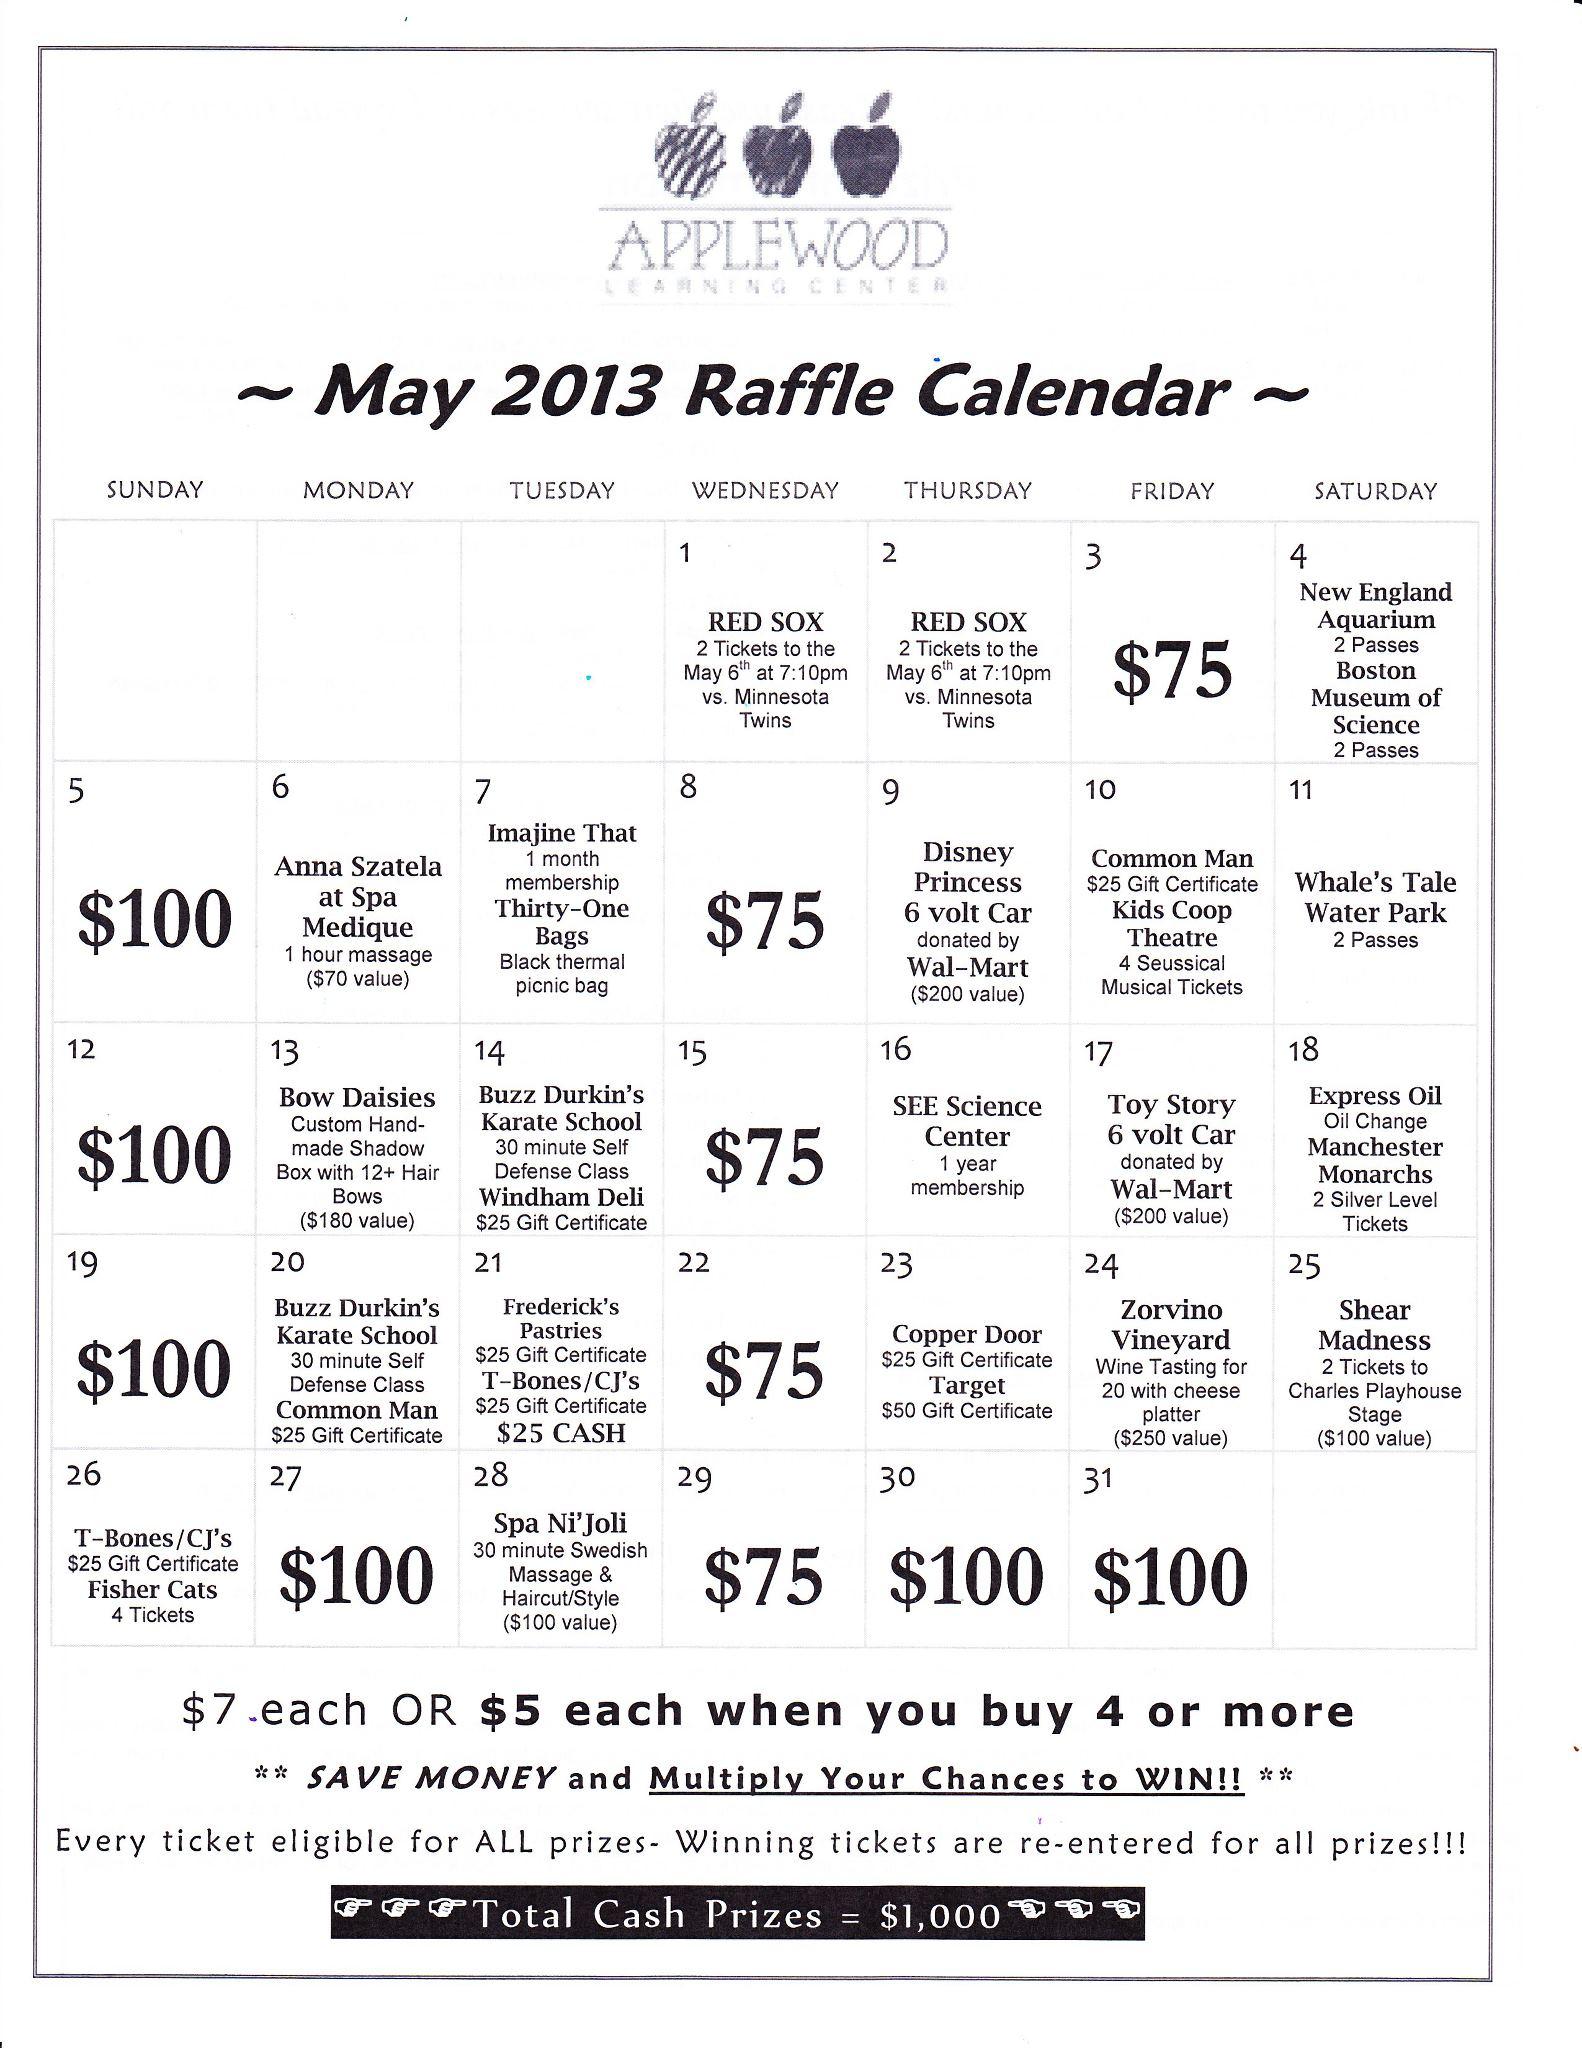 Monthly Calendar Raffle : Annual raffle calendar fundraiser applewood learning center